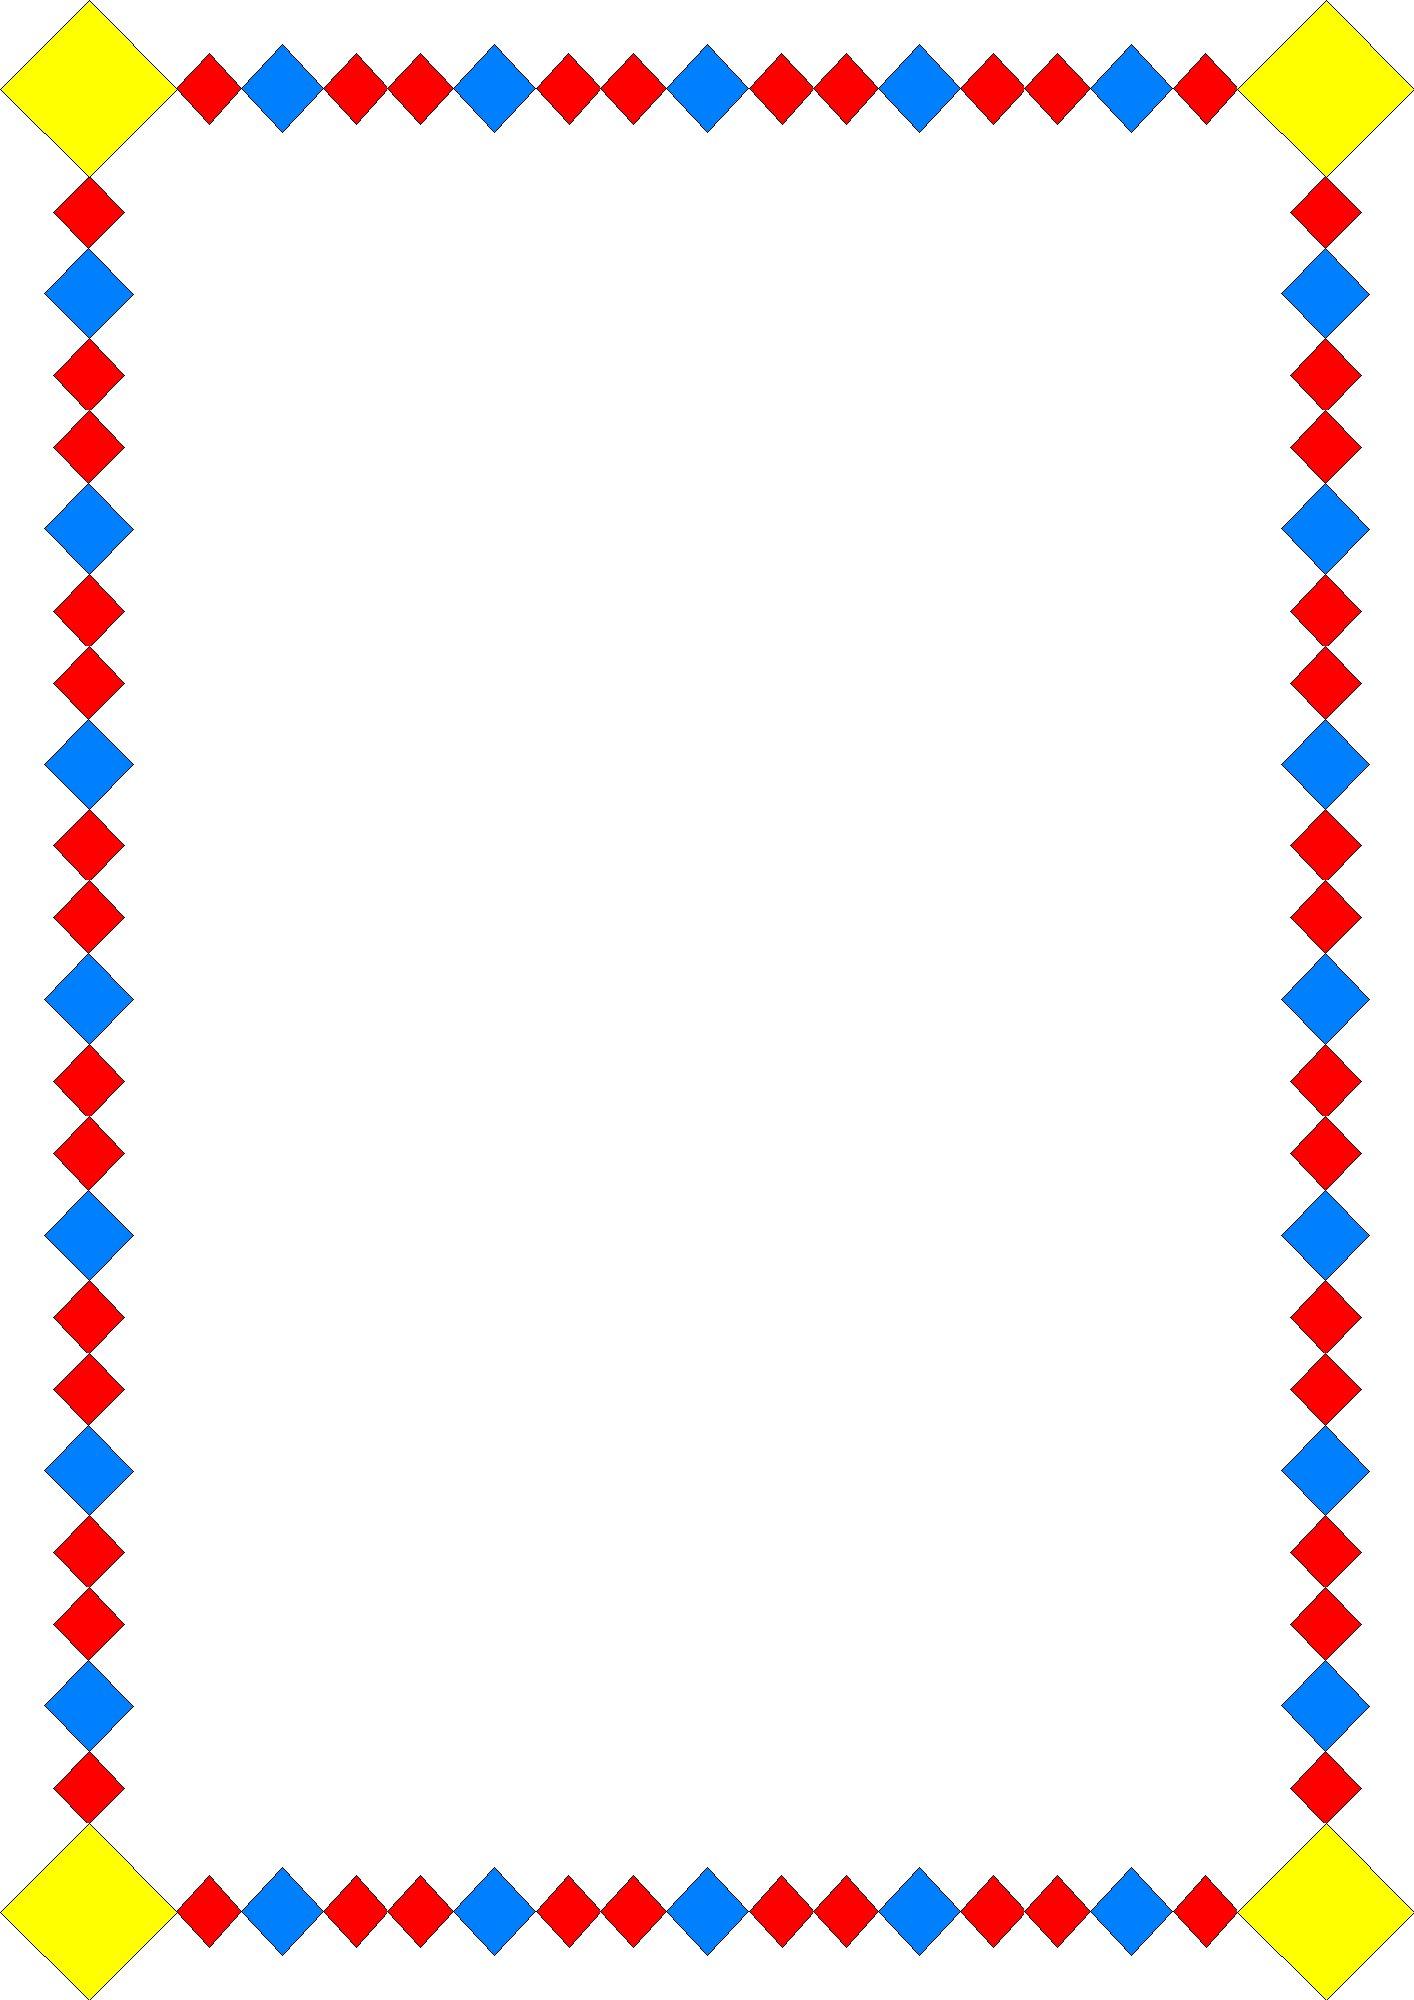 Frames Clip Art-Frames Clip Art-12